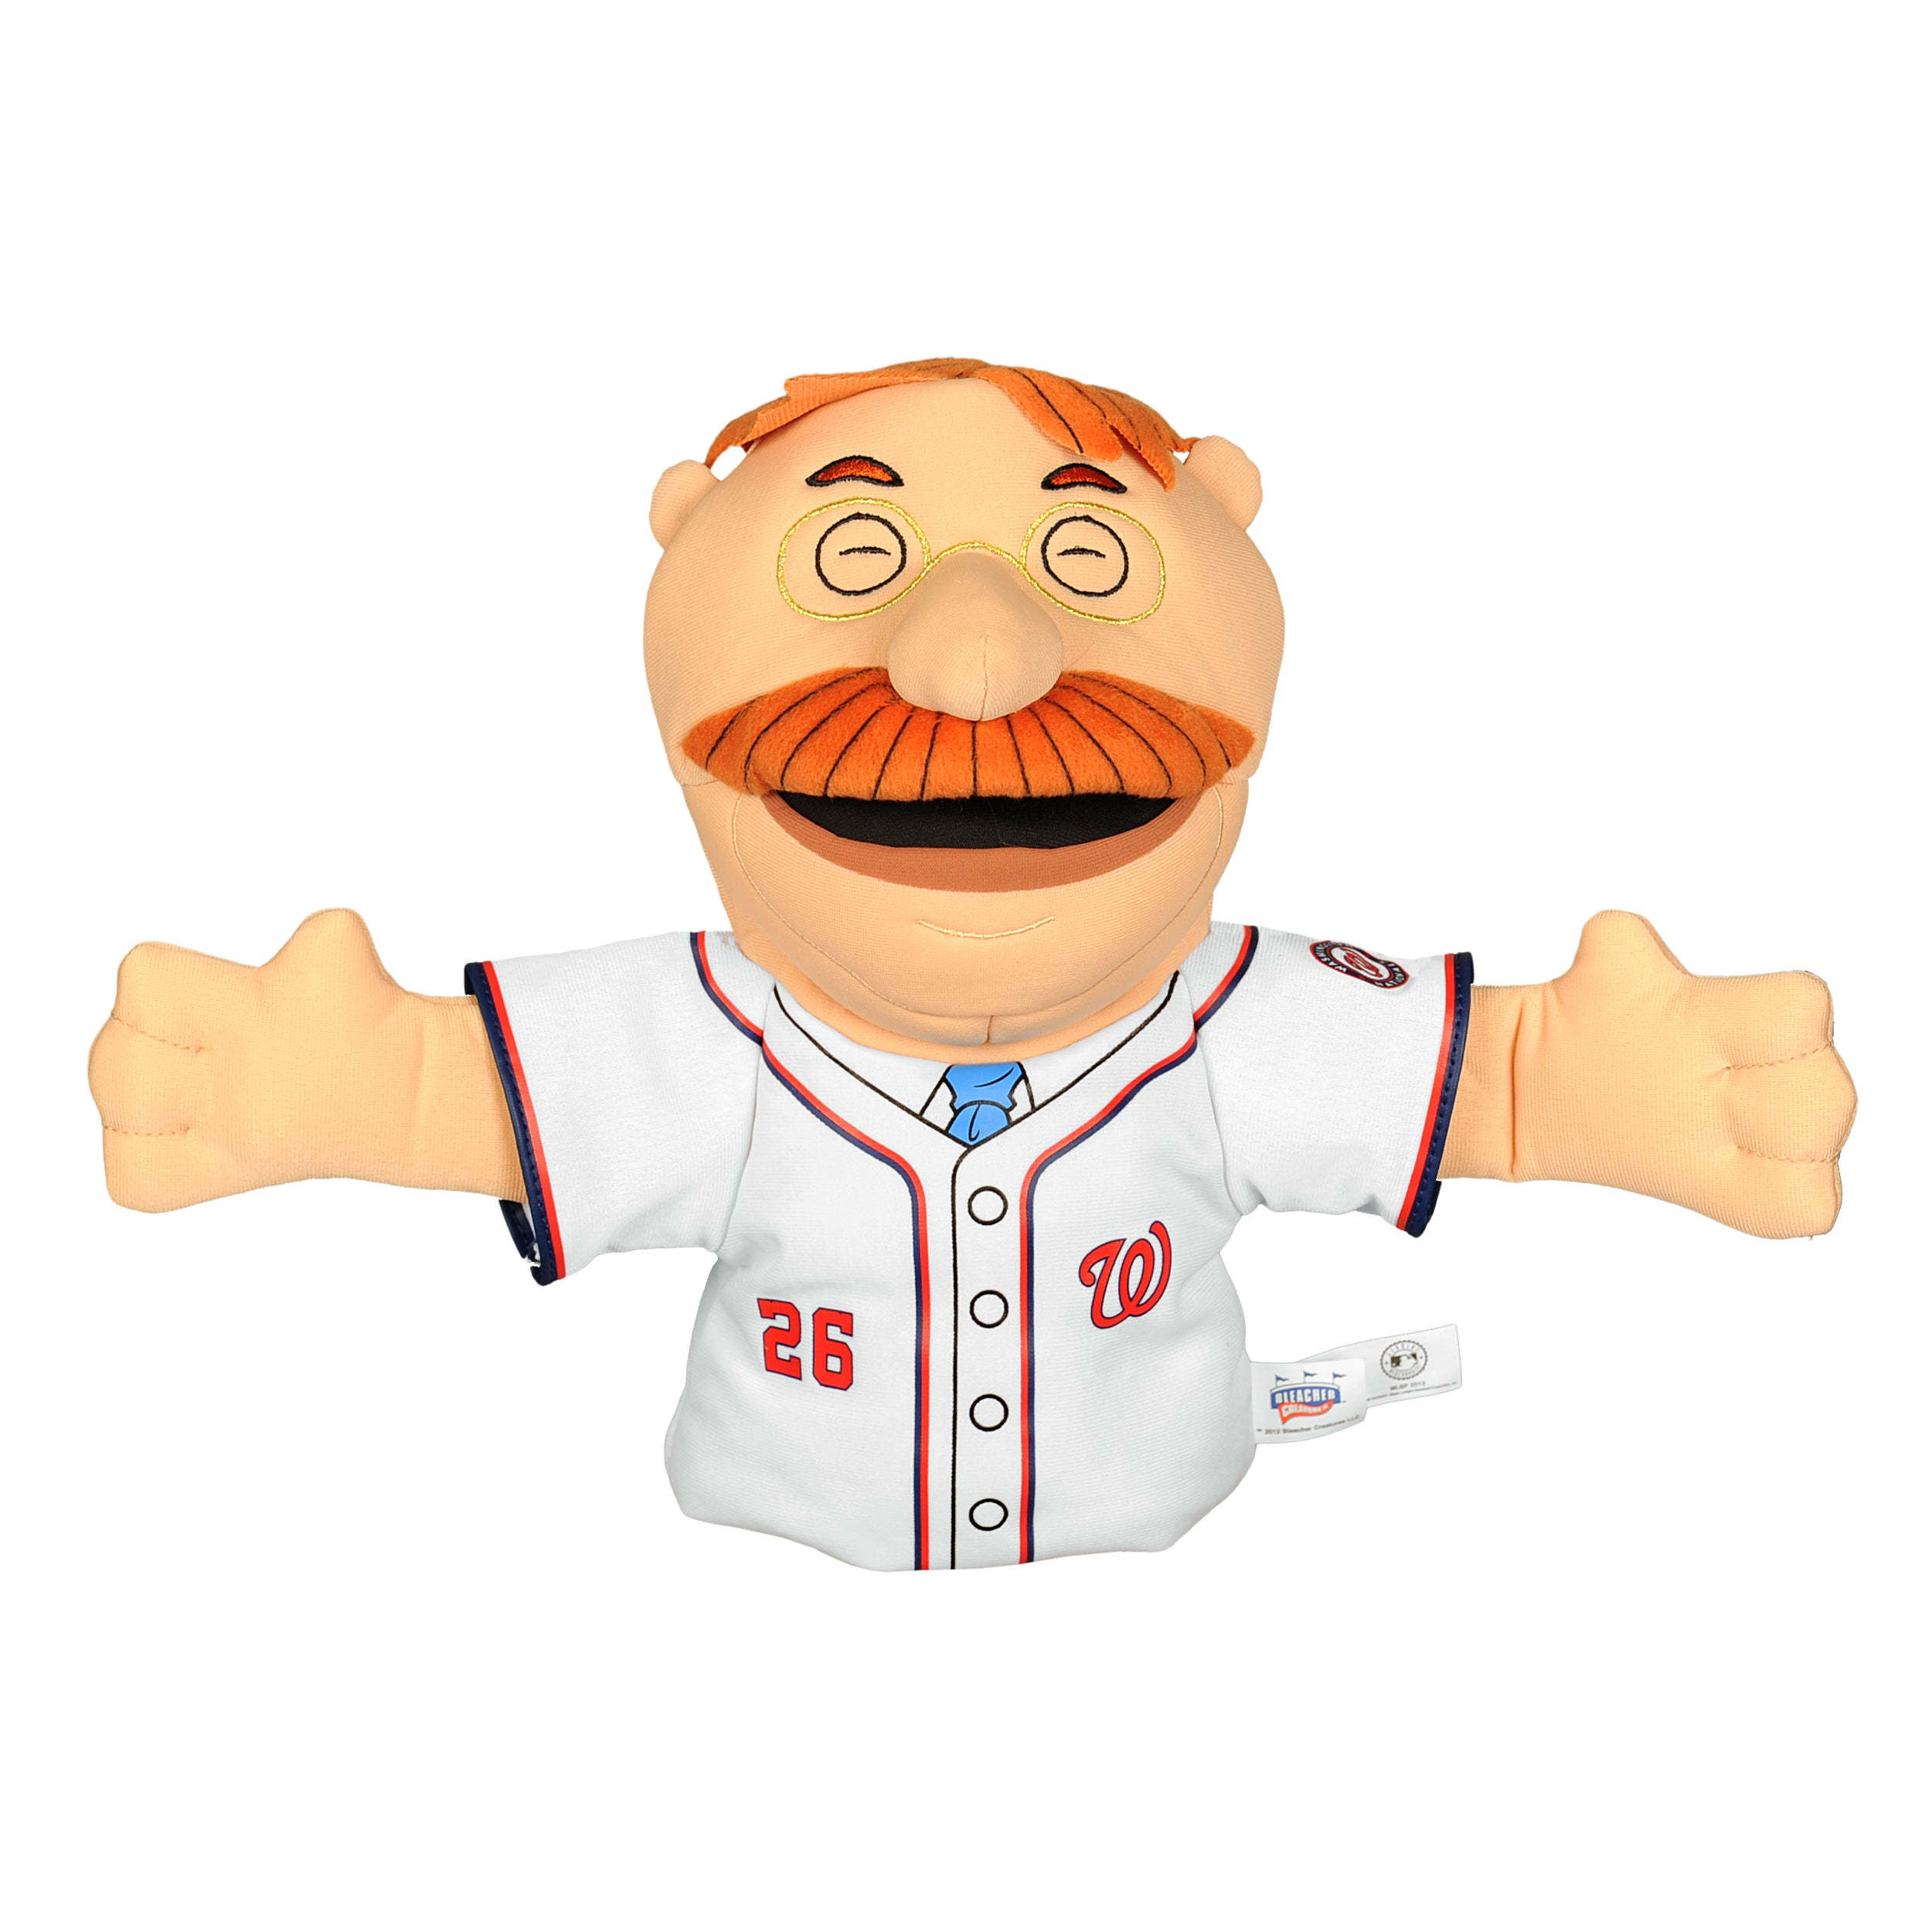 Washington Nationals 'Teddy Roosevelt' Mascot Hand Puppet